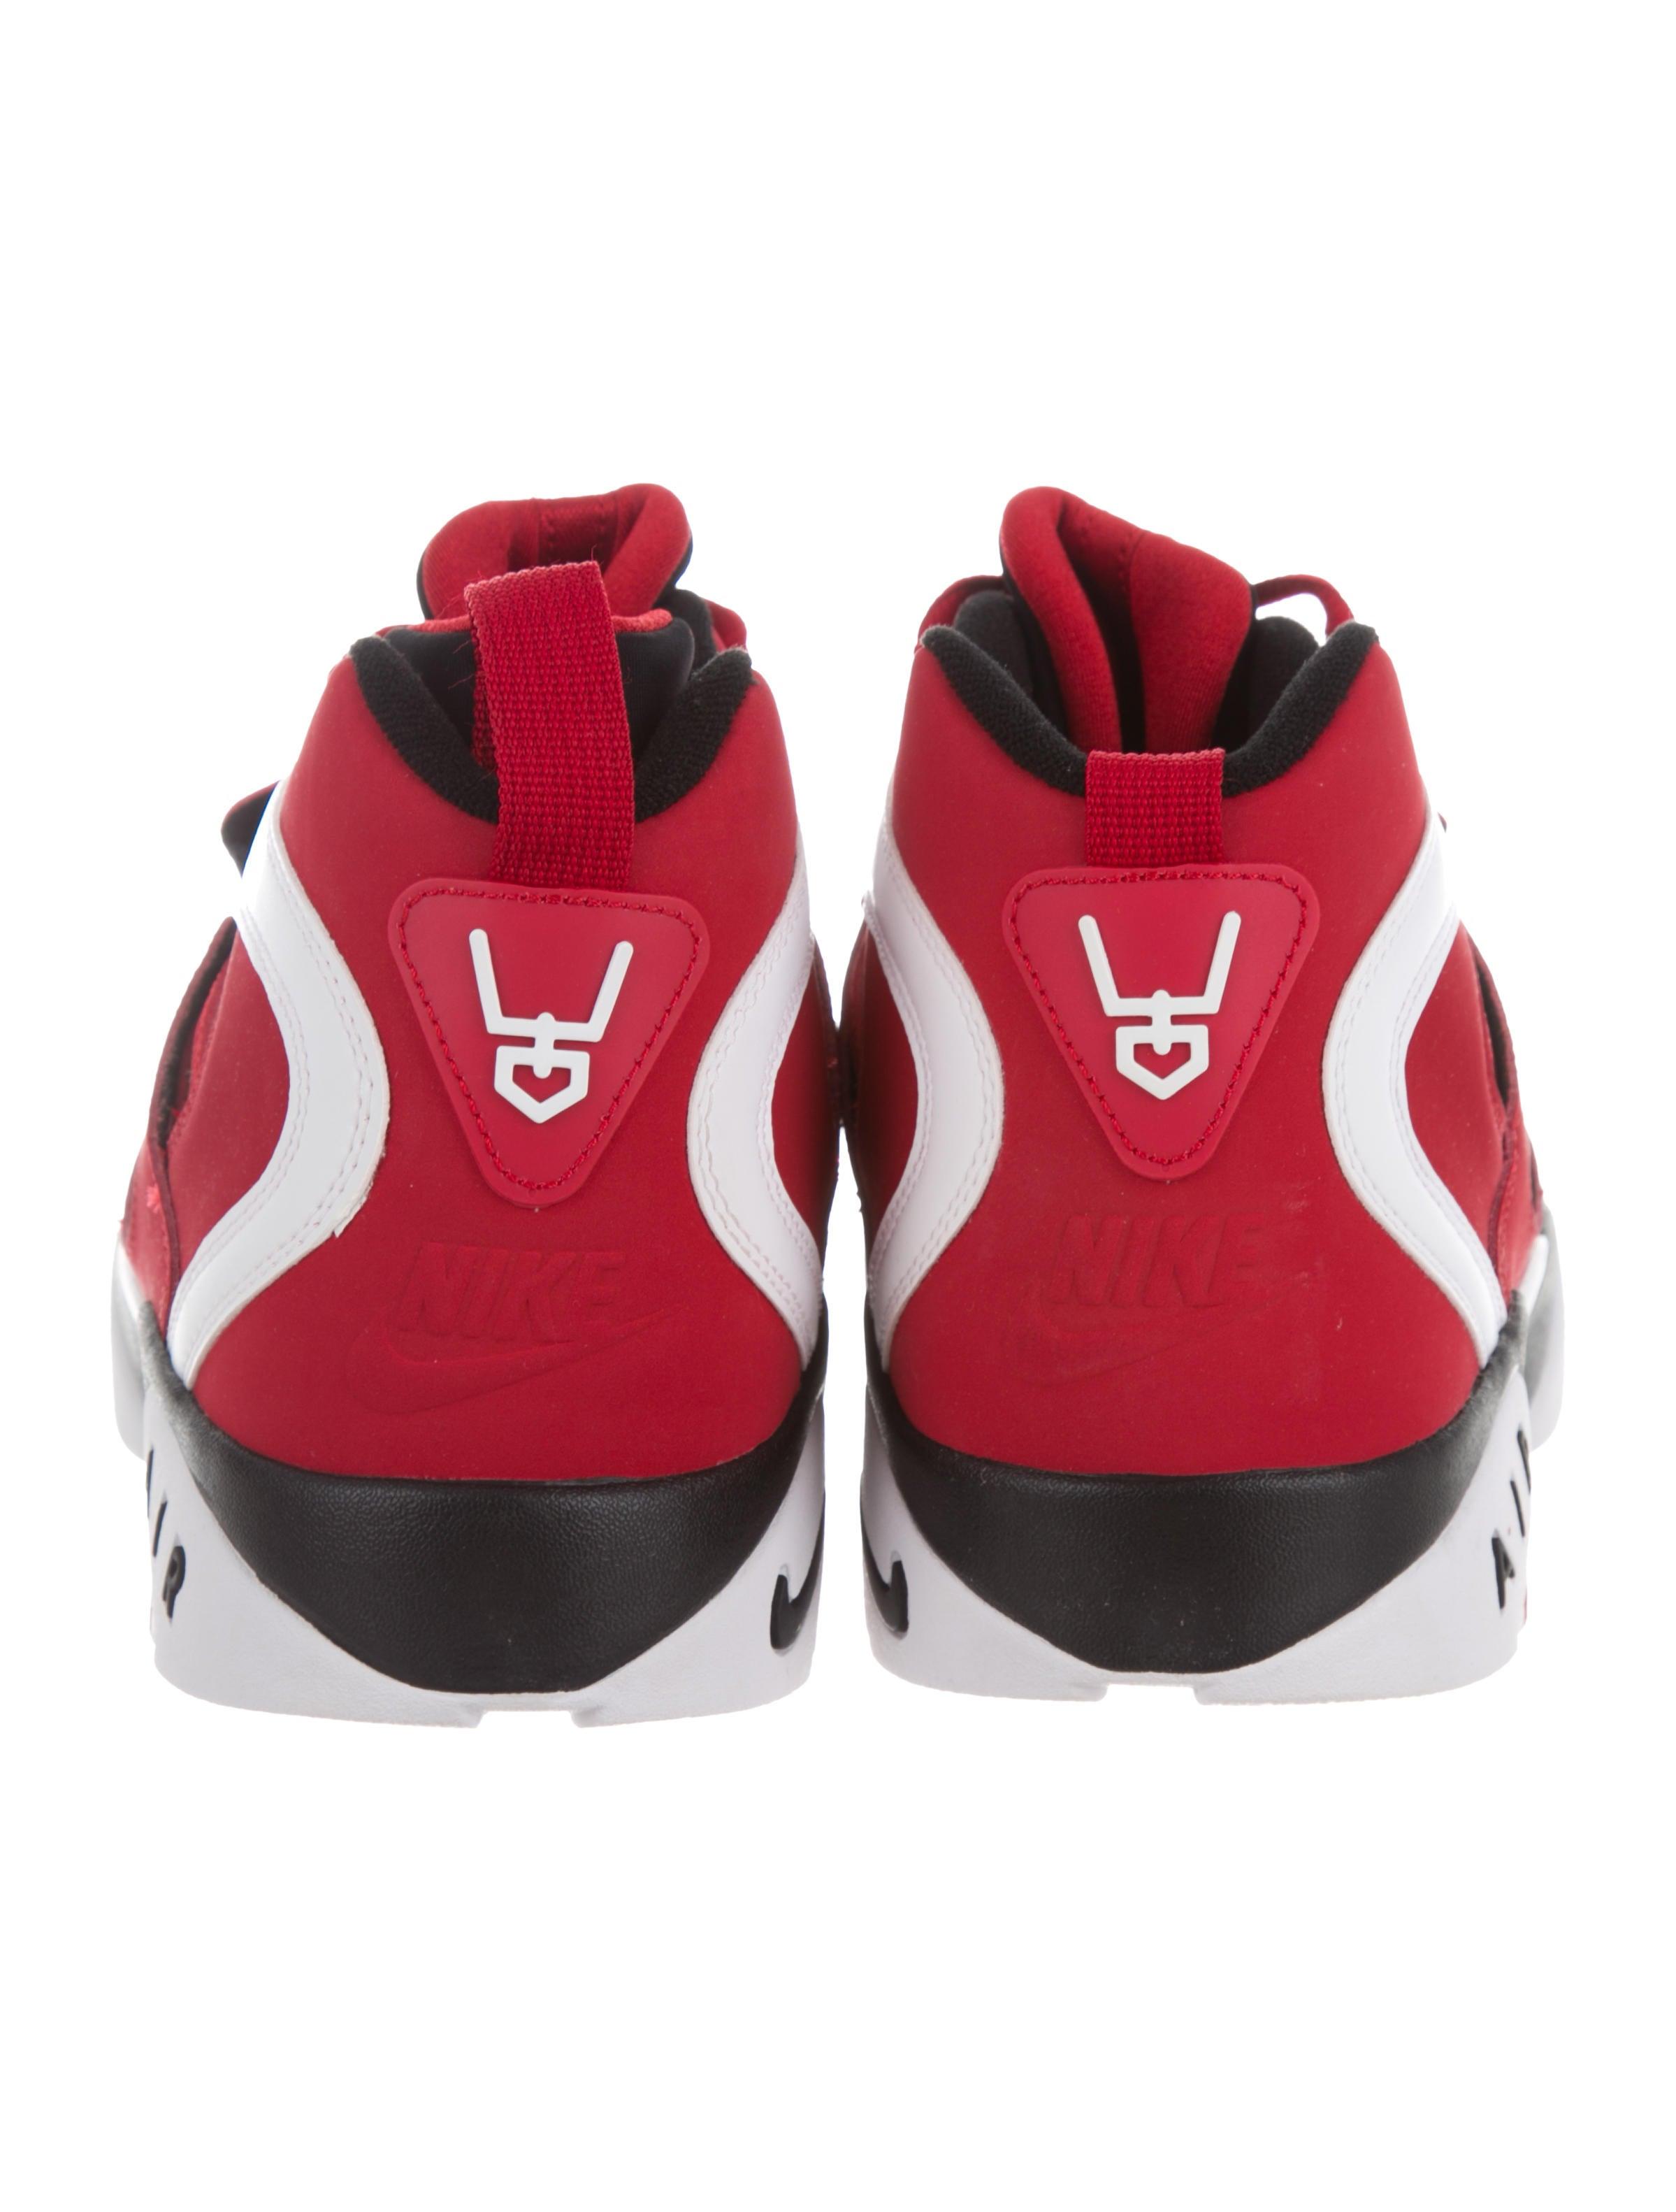 Details about Nike Air Diamond Turf 2 Varsity Red White Metallic Gold Black 5 Y Deion Sanders